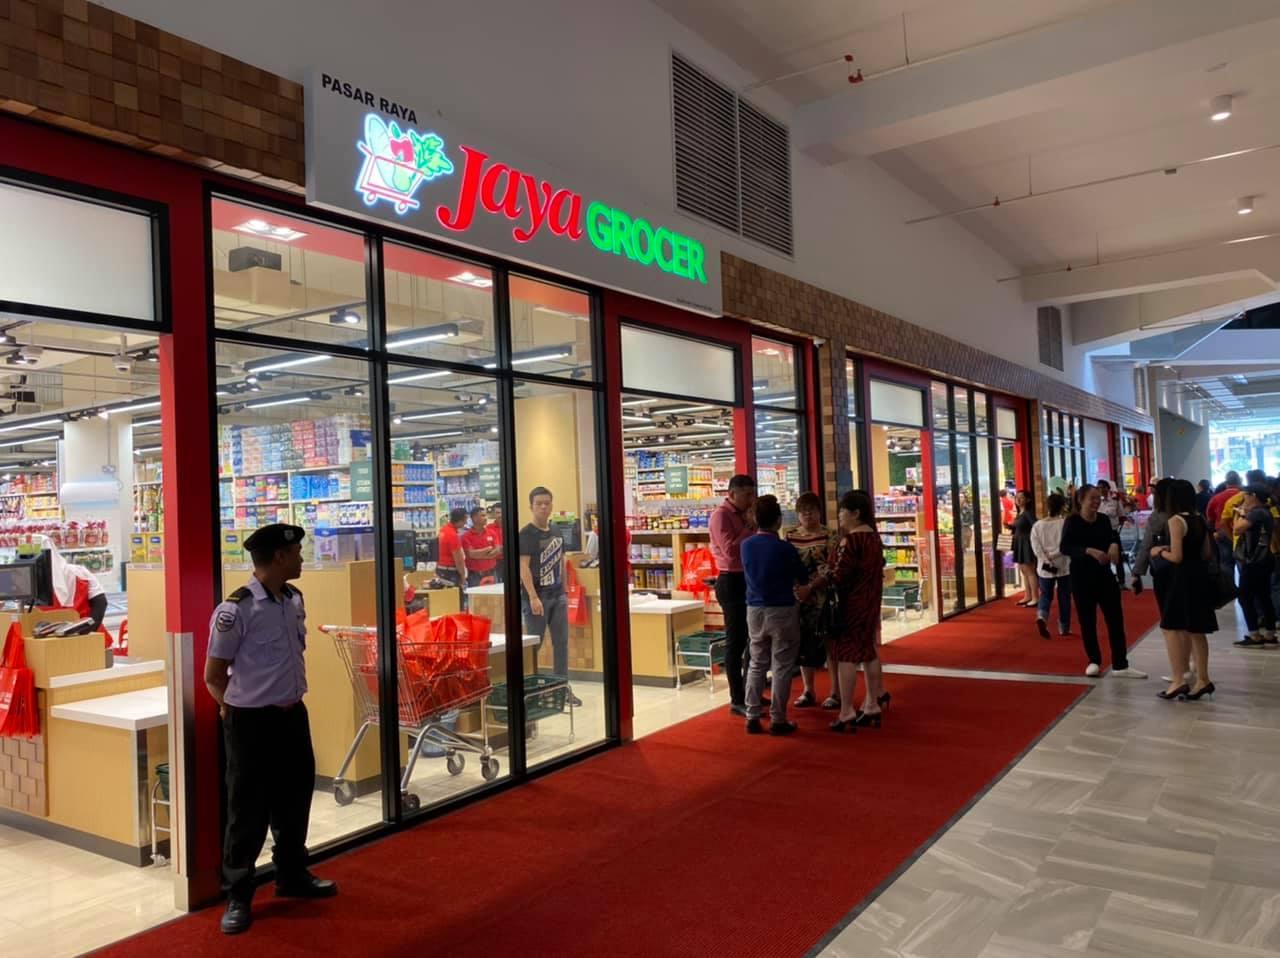 jaya grocer store